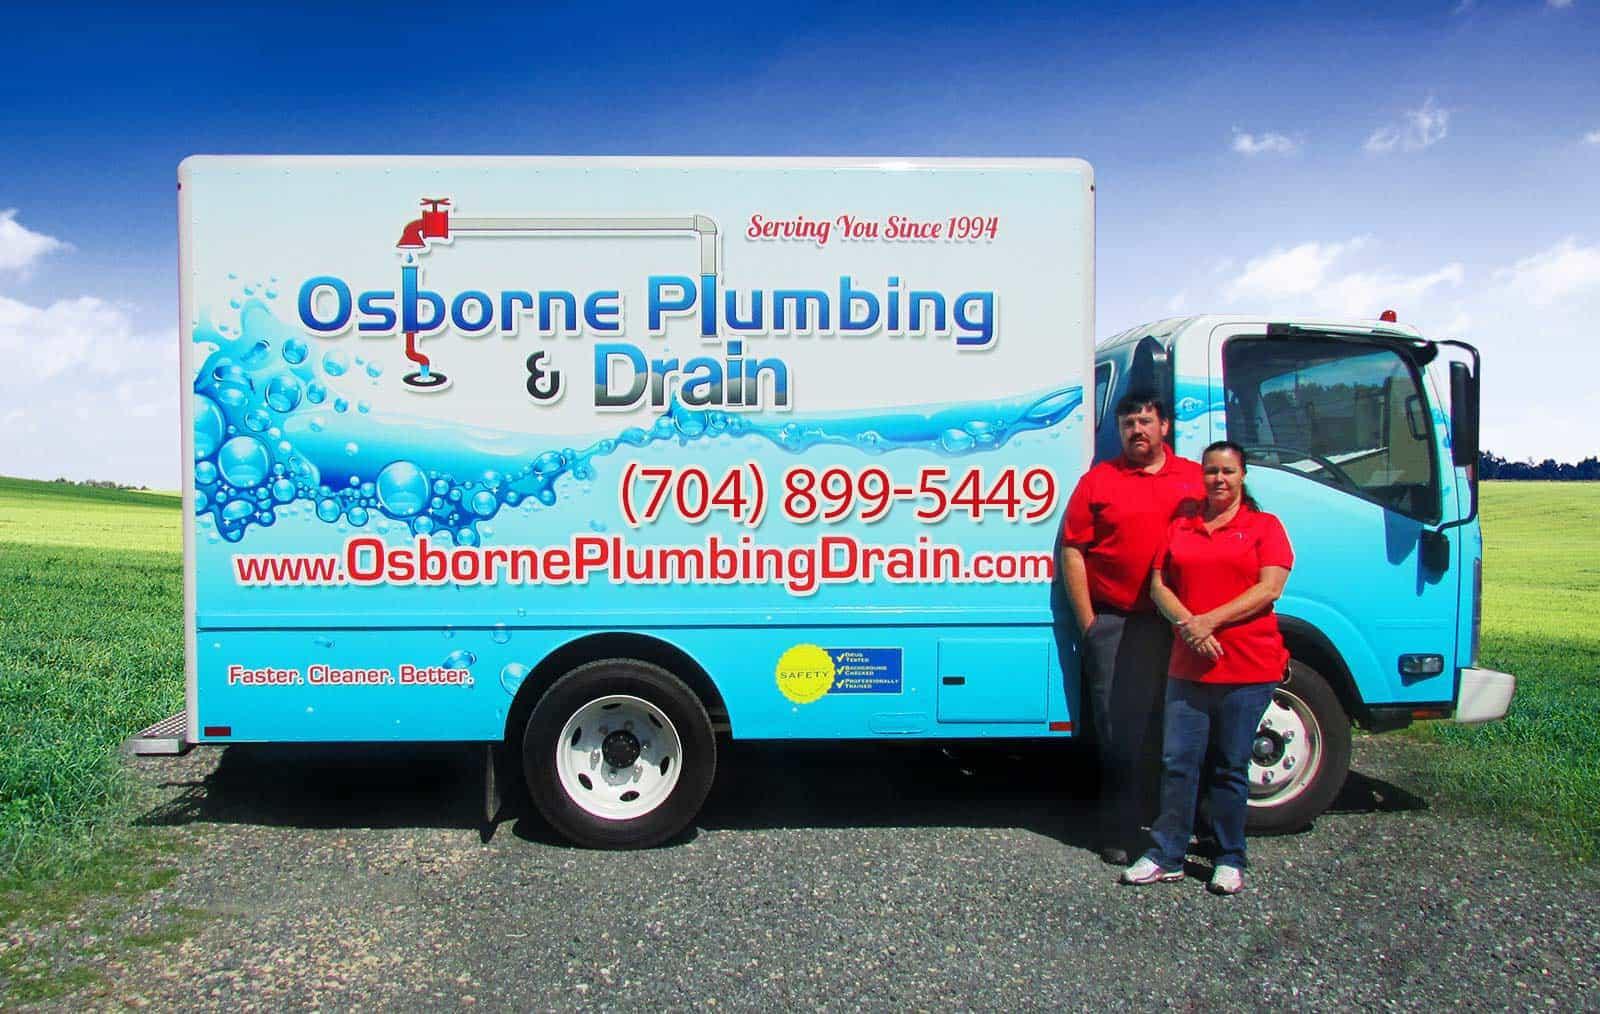 Osborne Plumbing Amp Drain In Charlotte Nc Expert